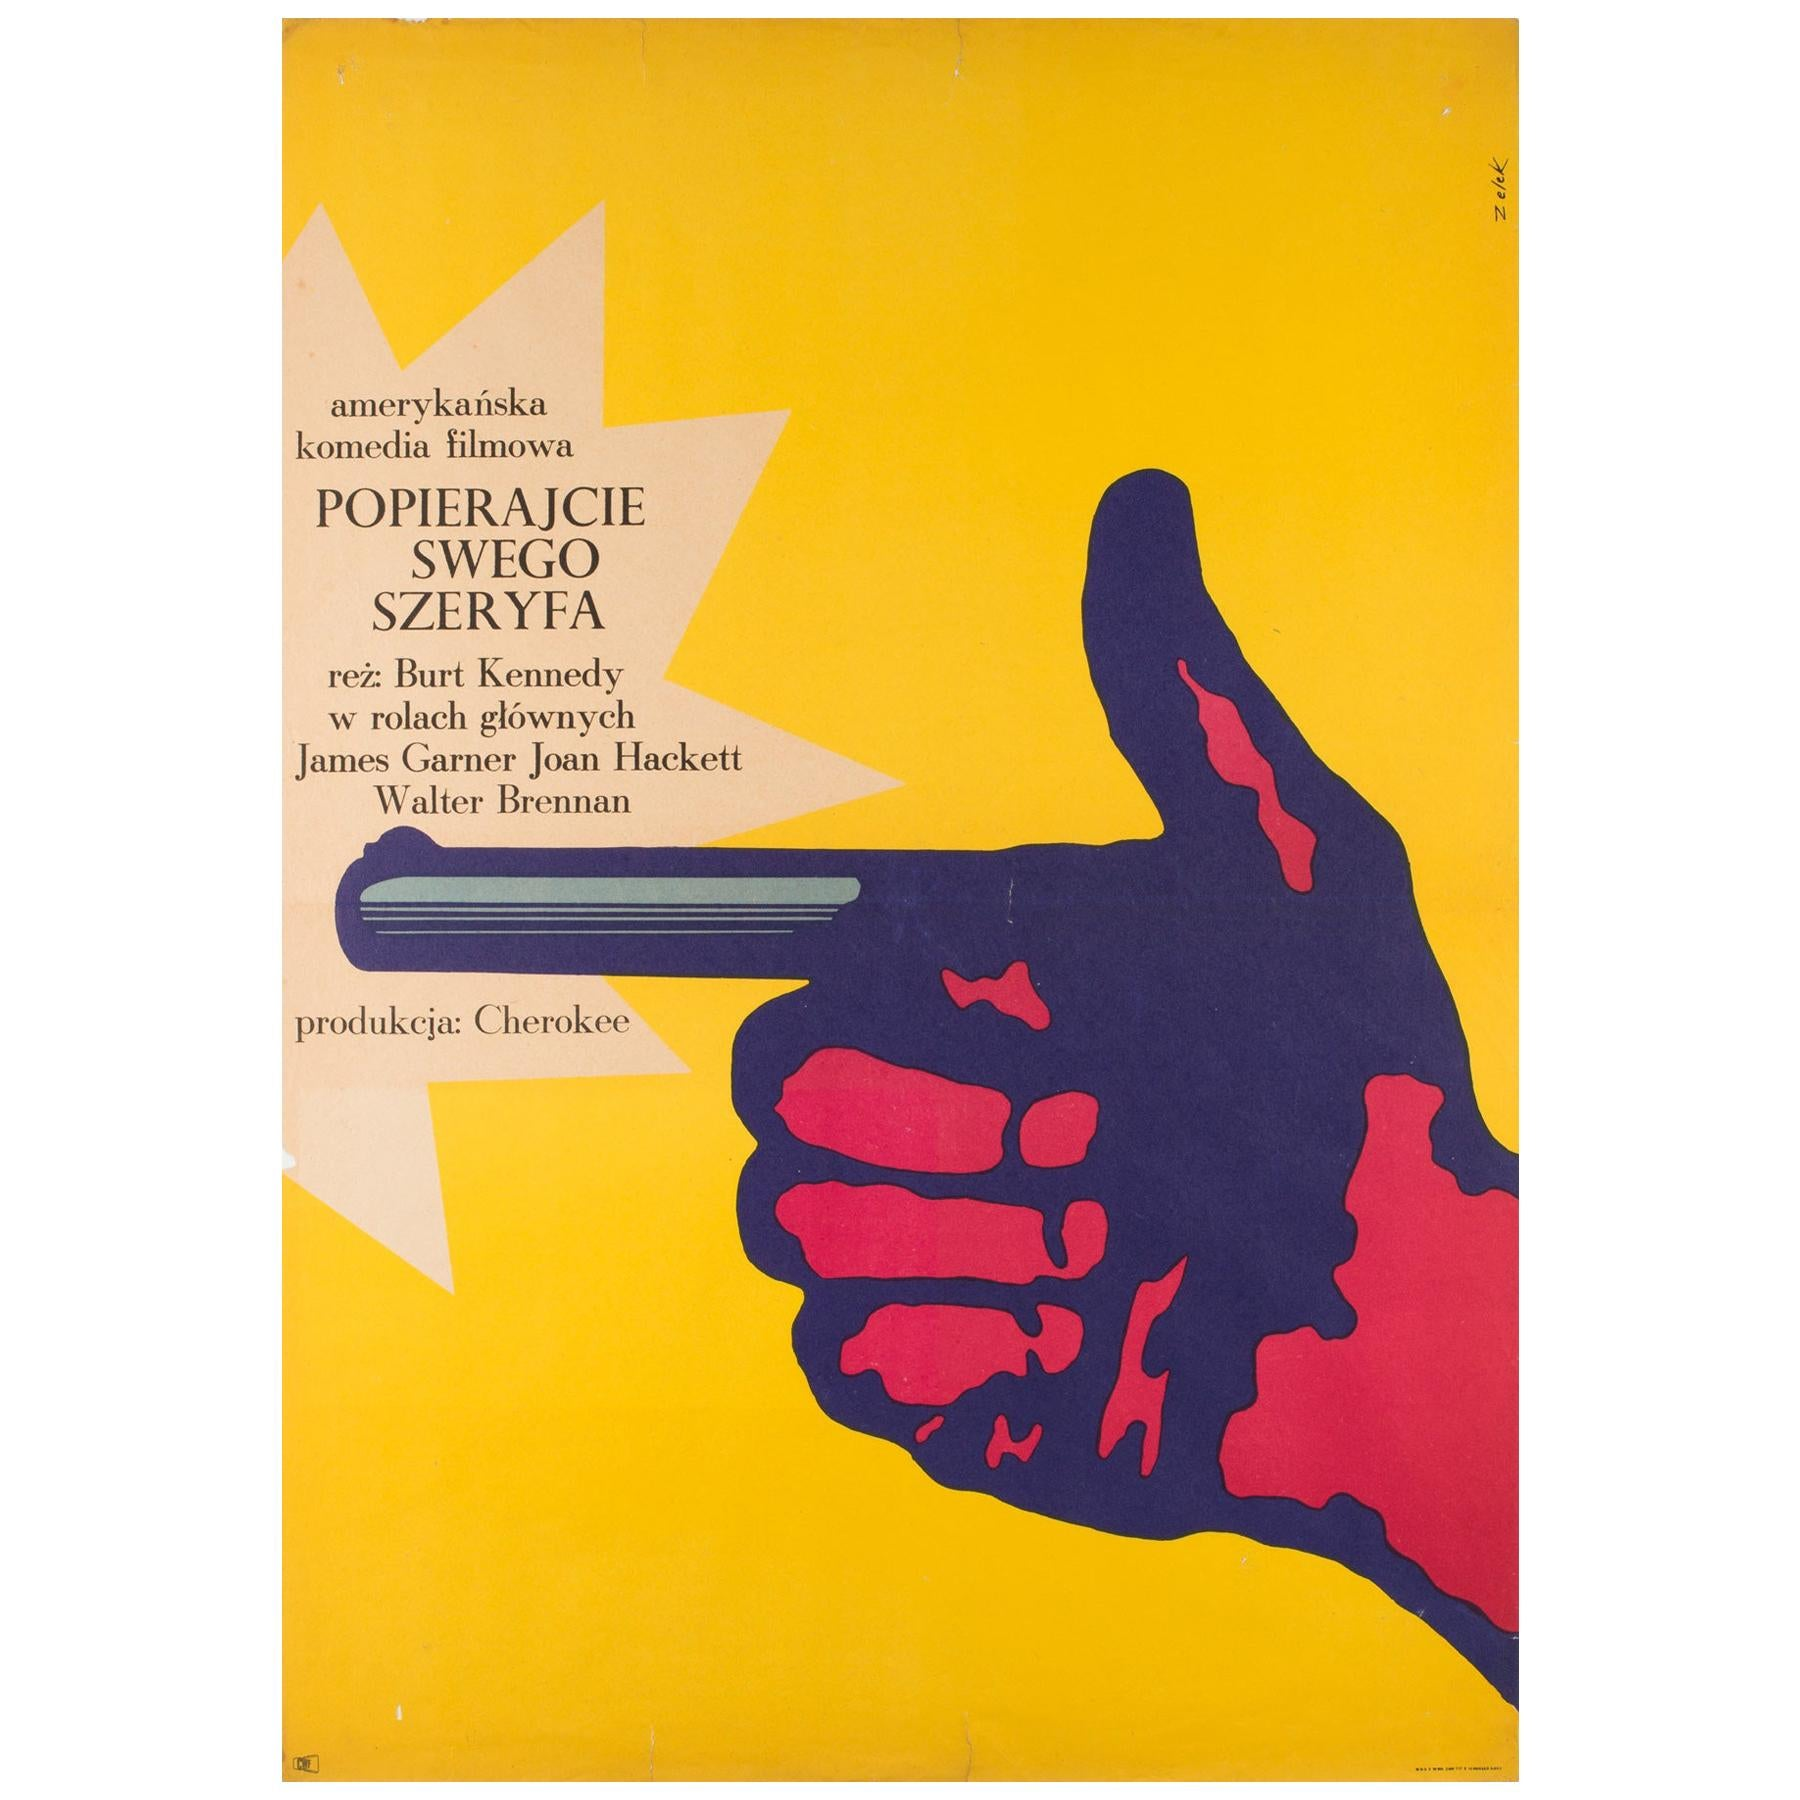 Support Your Local Sheriff, Original Polish Film Poster Bronislaw Zelek, 1969